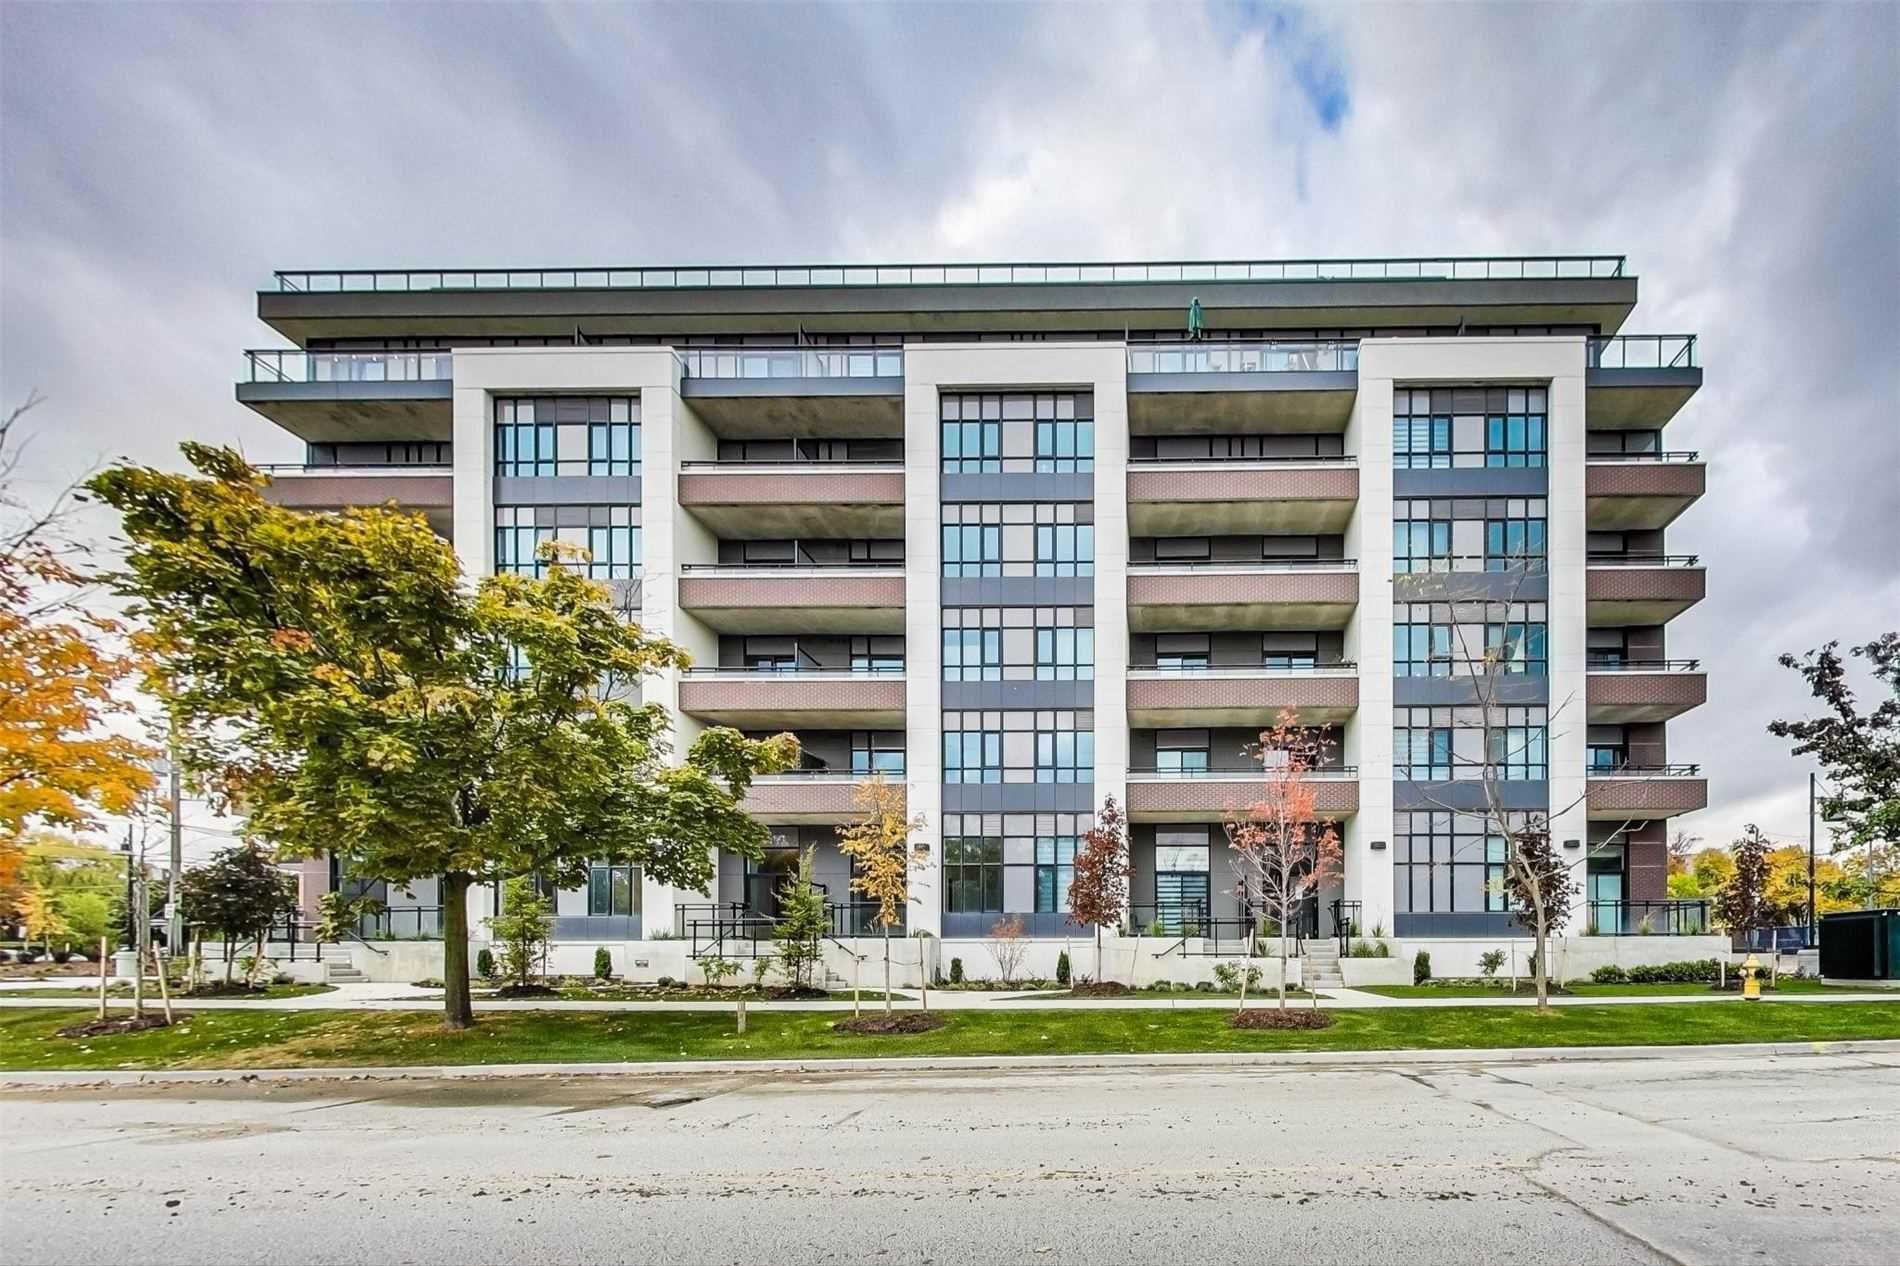 Main Photo: 506 1 Neighbourhood Lane in Toronto: Stonegate-Queensway Condo for lease (Toronto W07)  : MLS®# W5058935